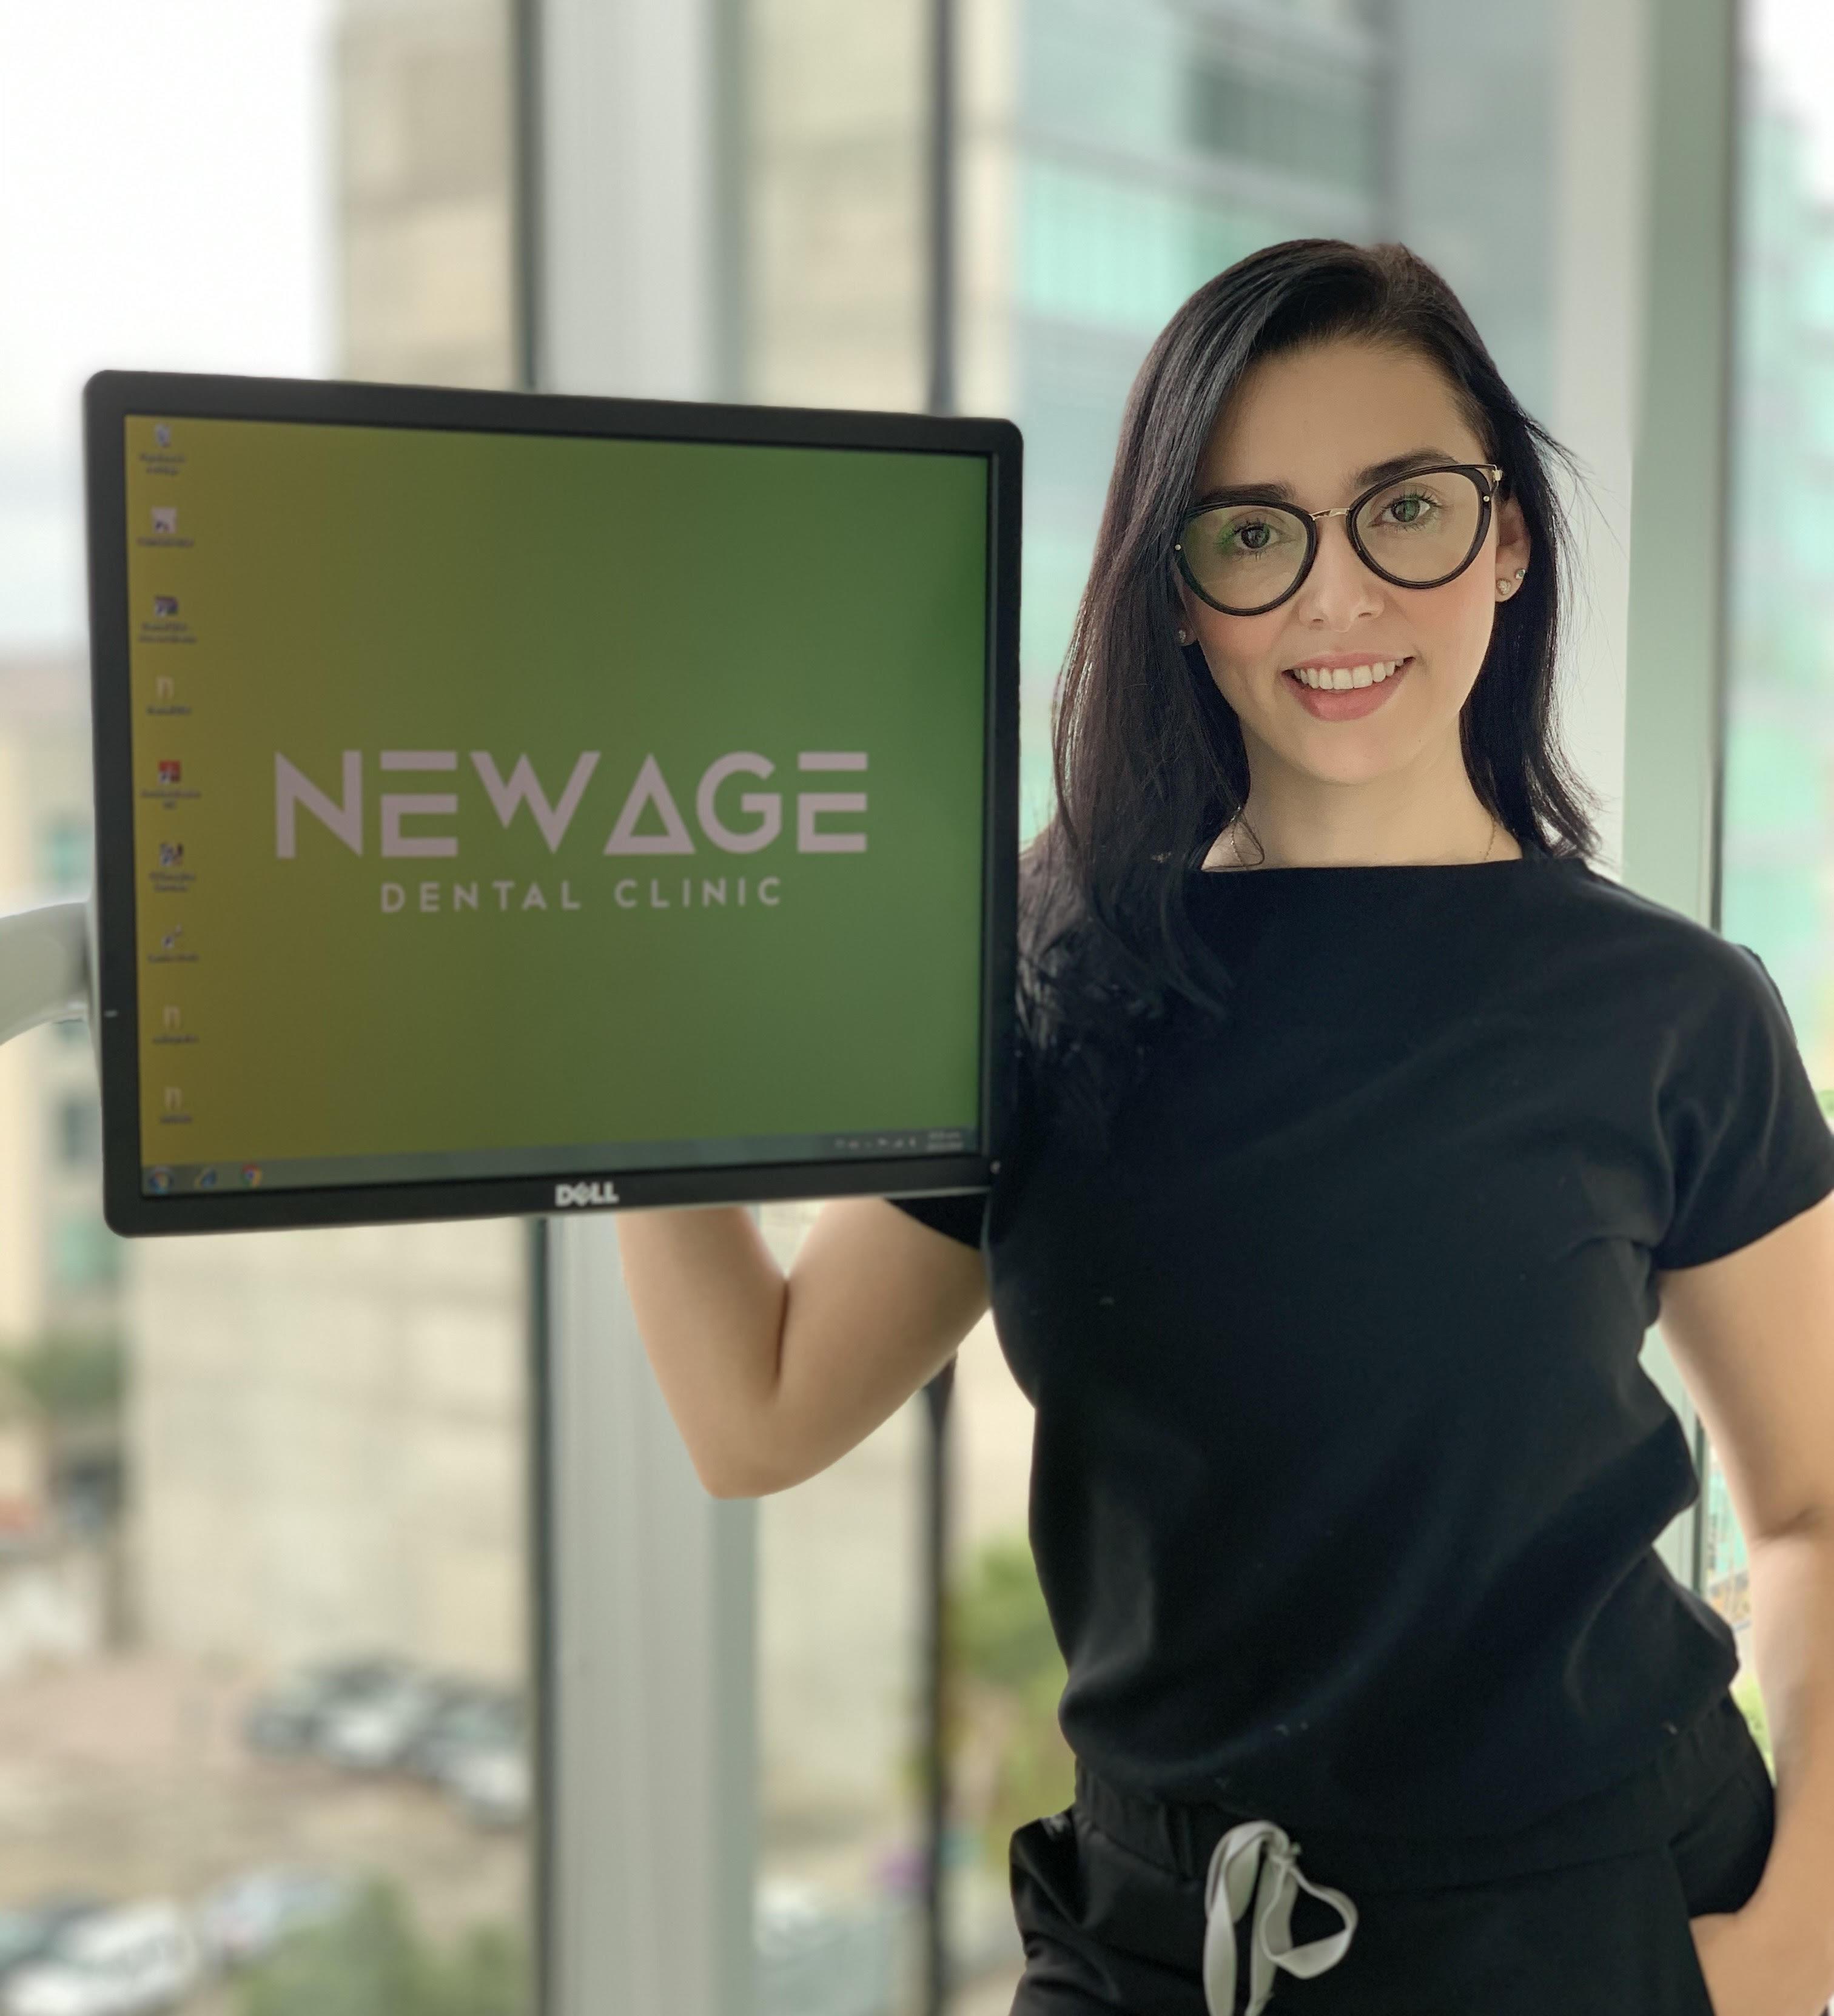 Dr. Silvia Guzman cosmetic dentist in Tijuana